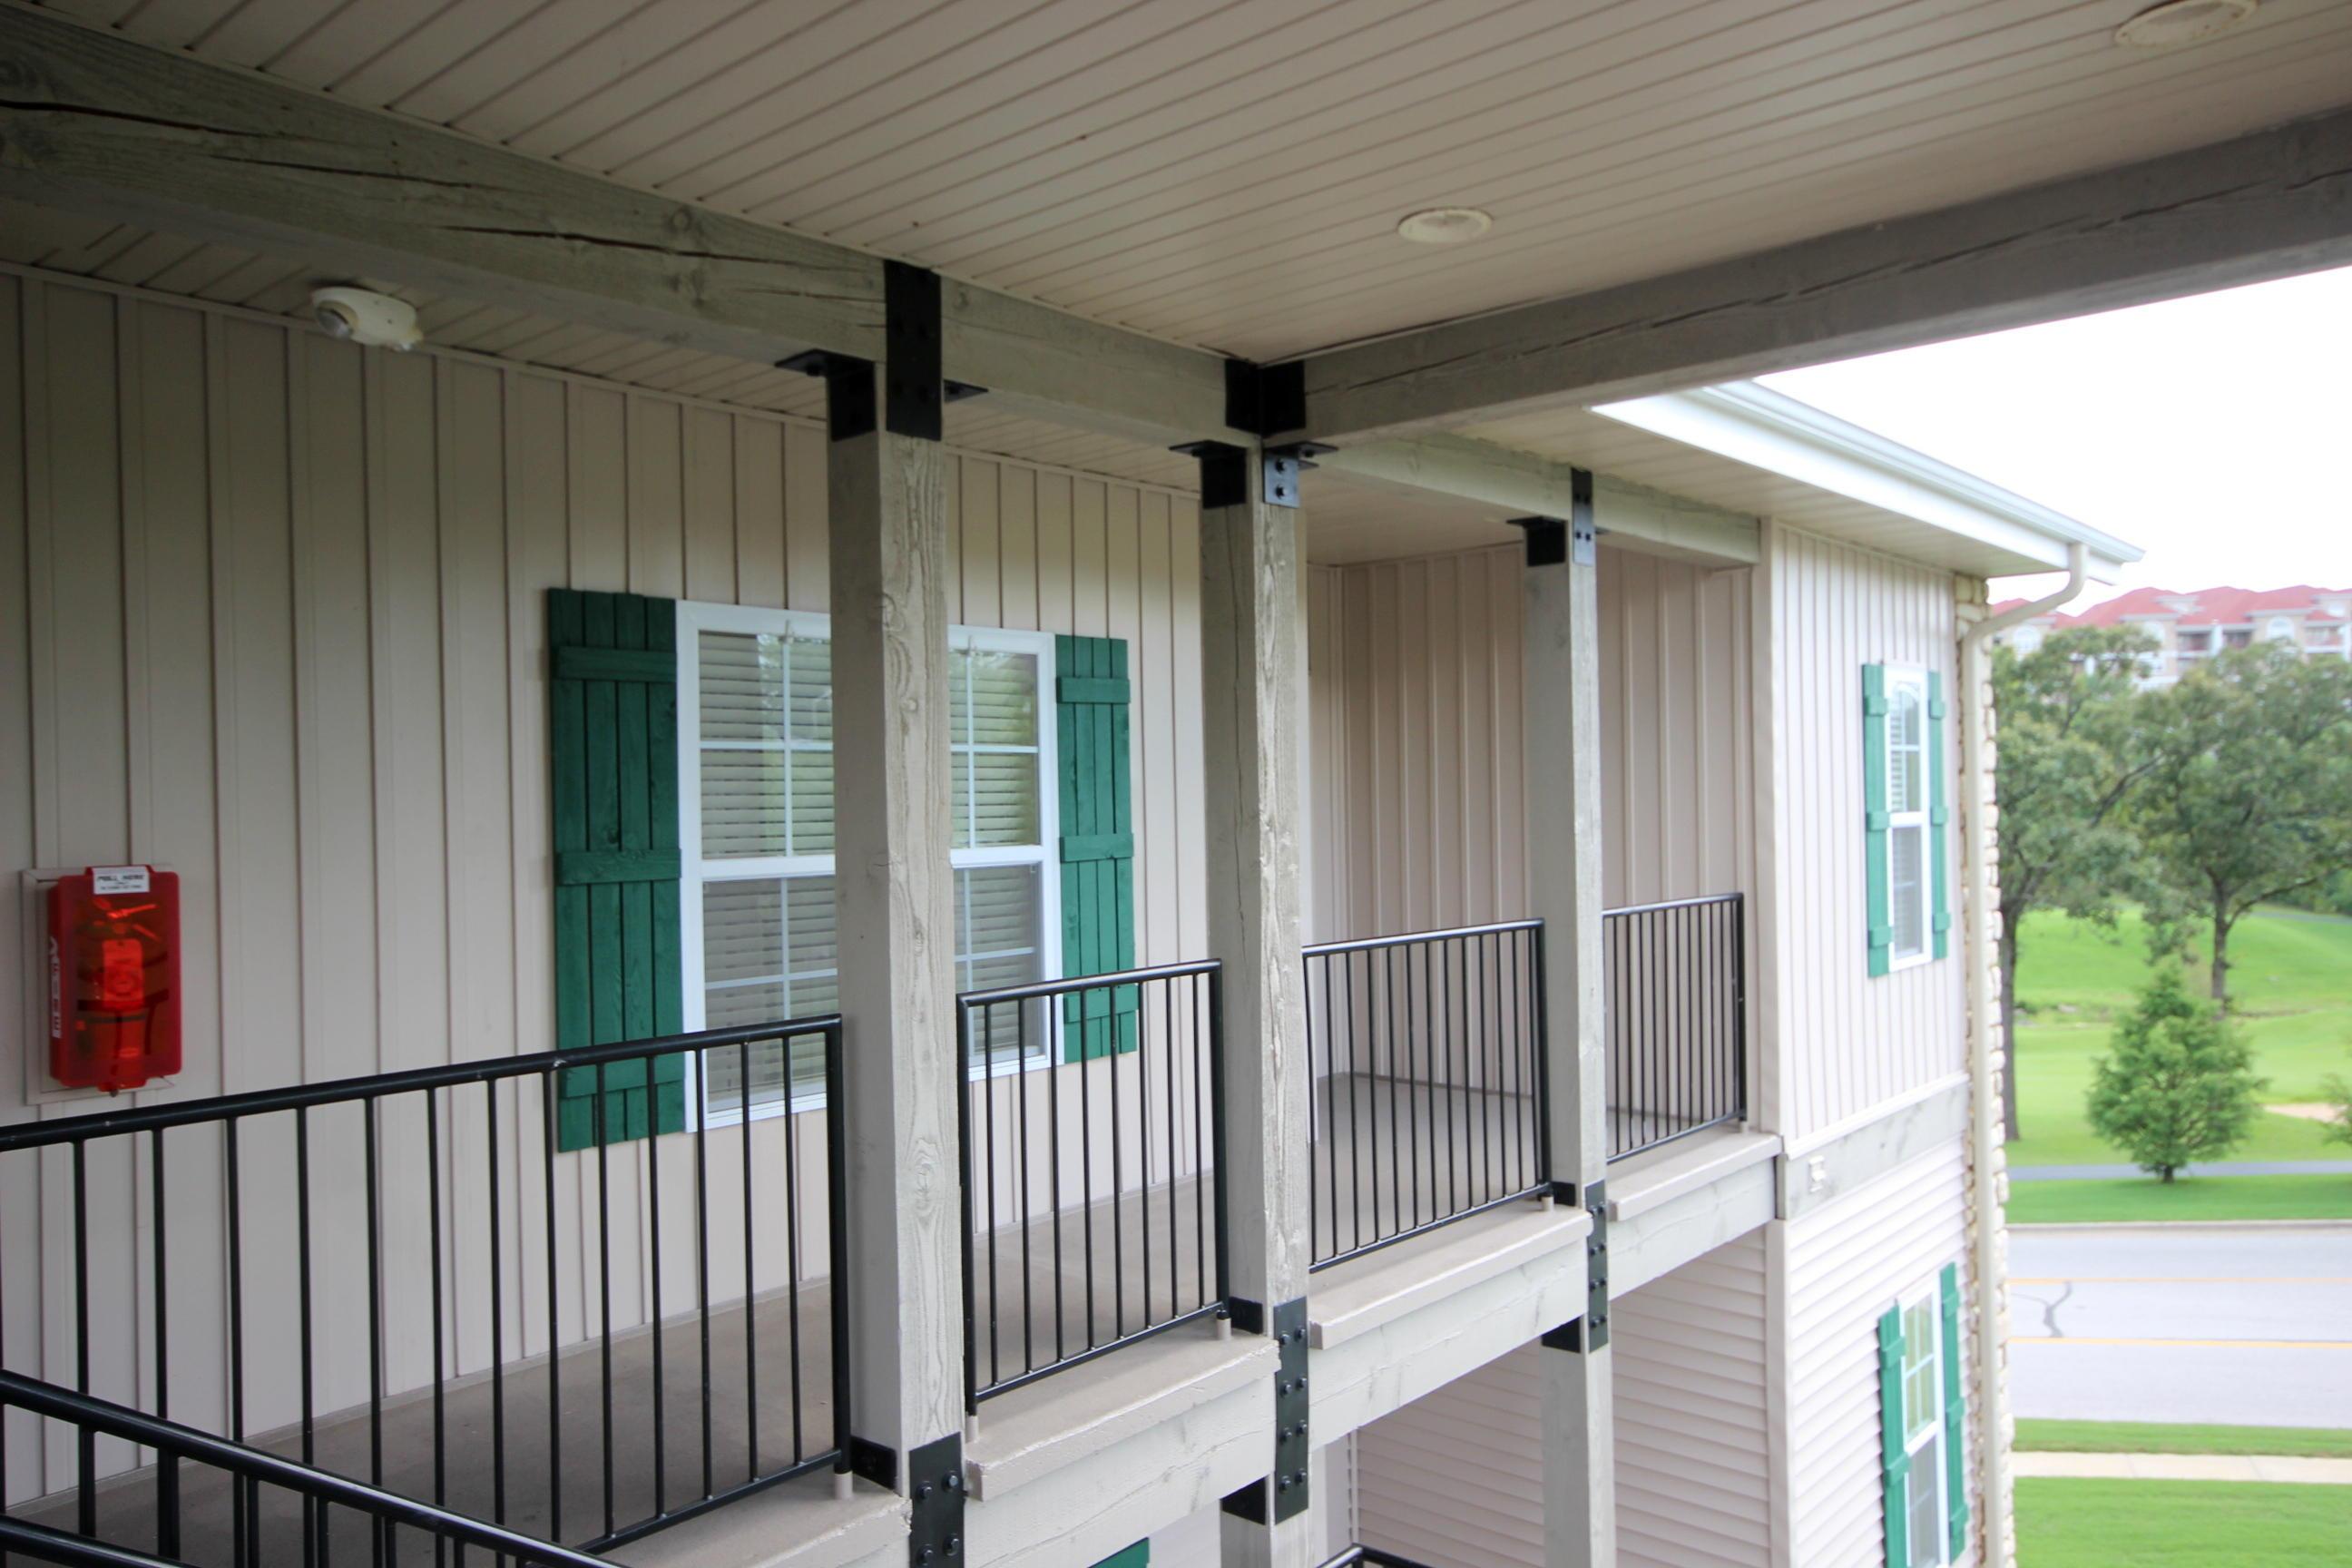 310 South Wildwood Drive #8 Branson, MO 65616